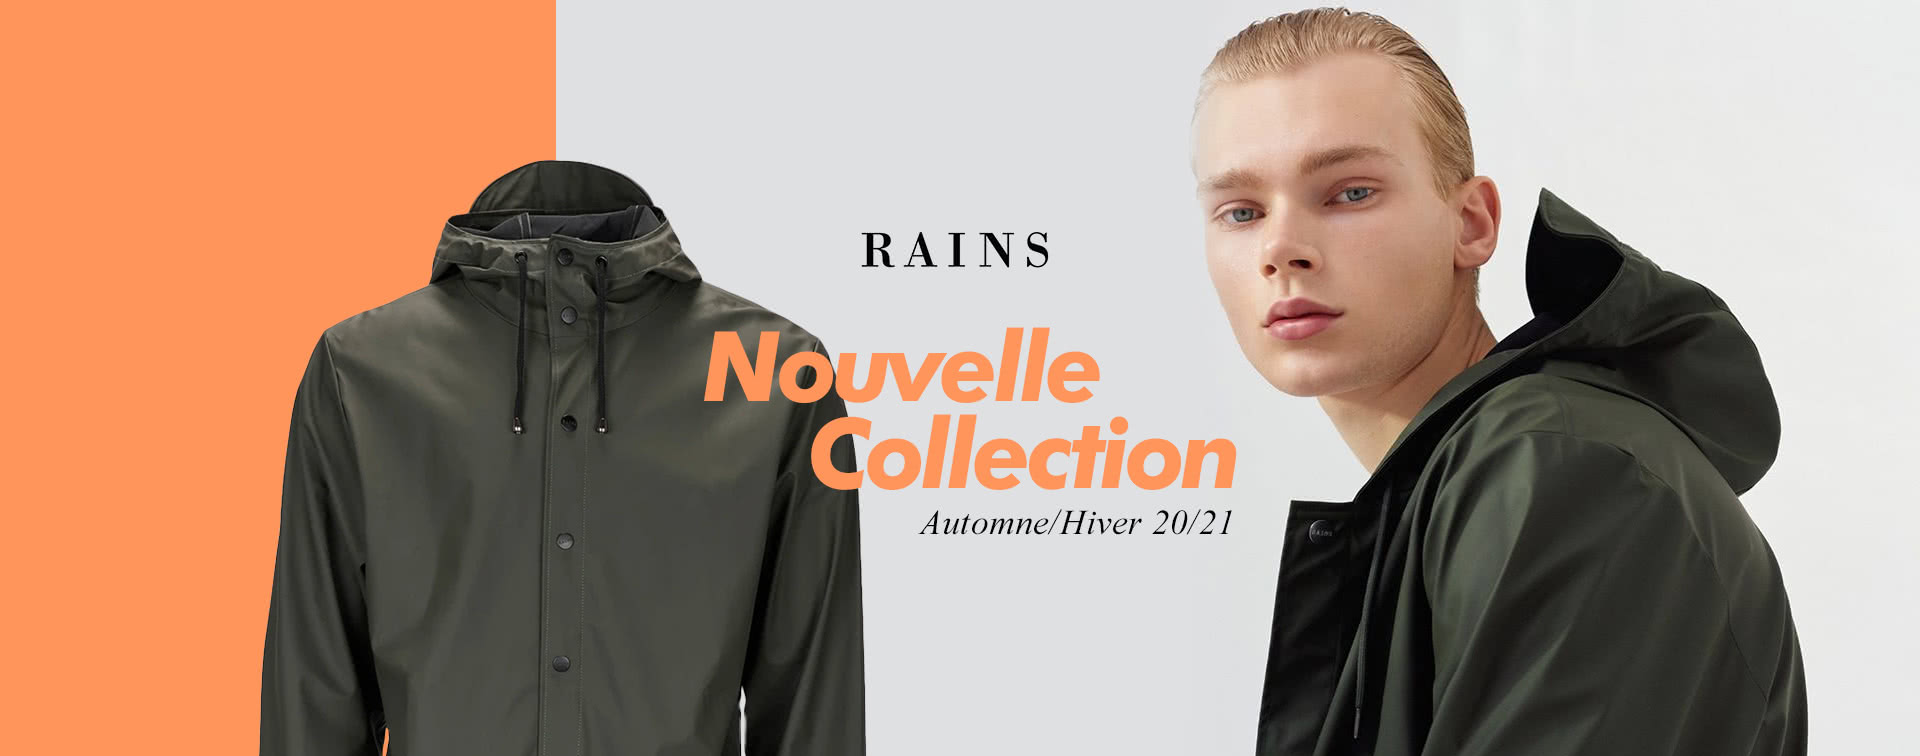 Vêtements imperméable RAINS